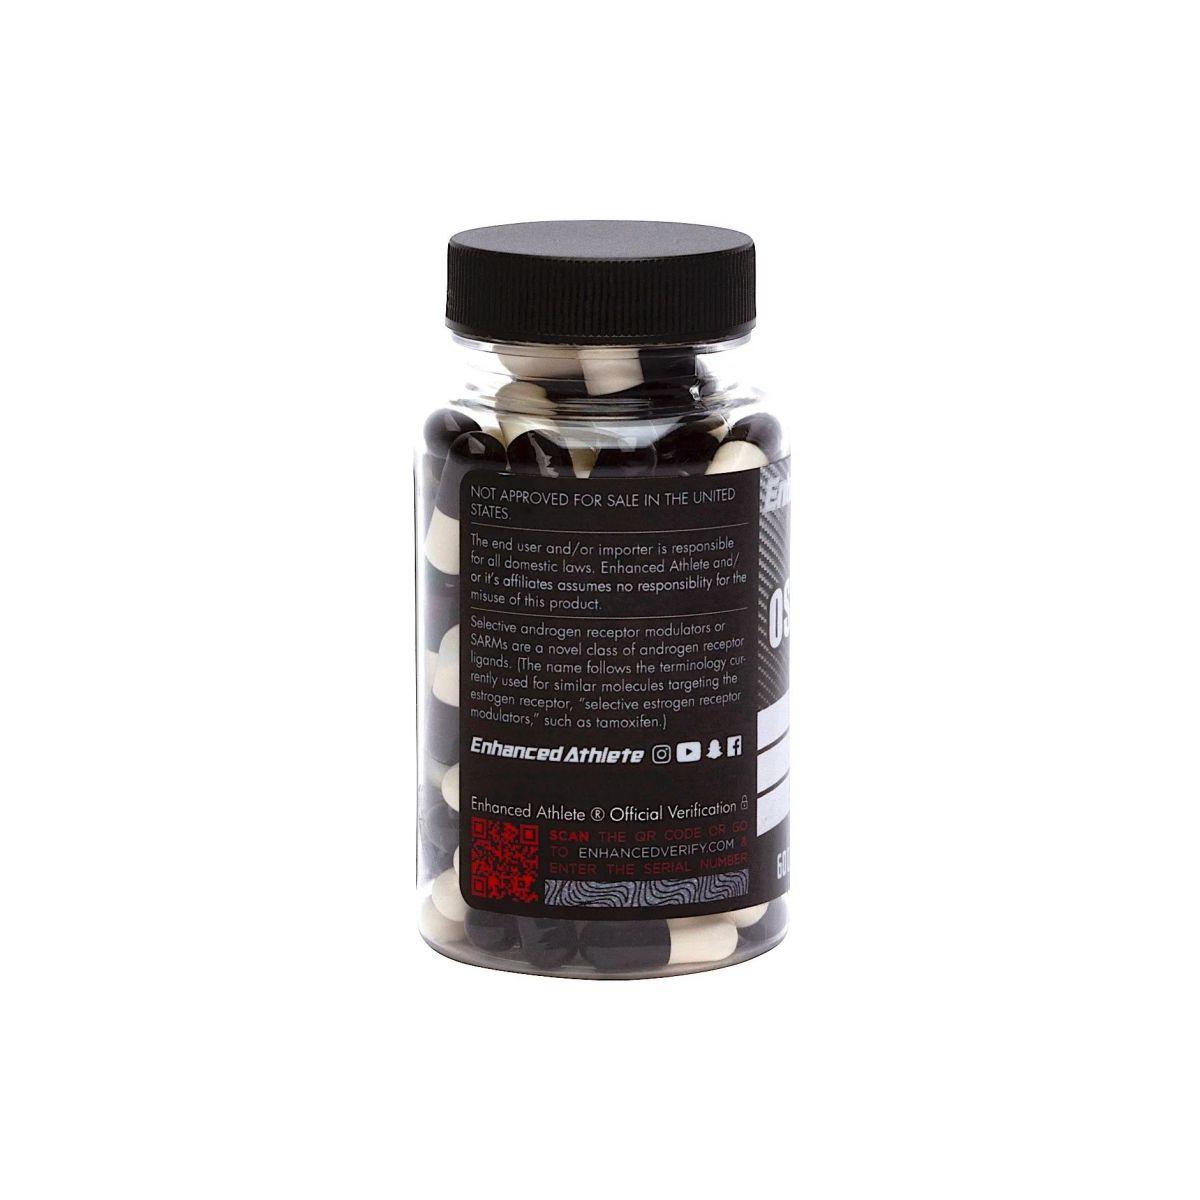 Sarm Ostamuscle (mk-2866 - Ostarine) 10mg 60 caps - Enhanced Athlete